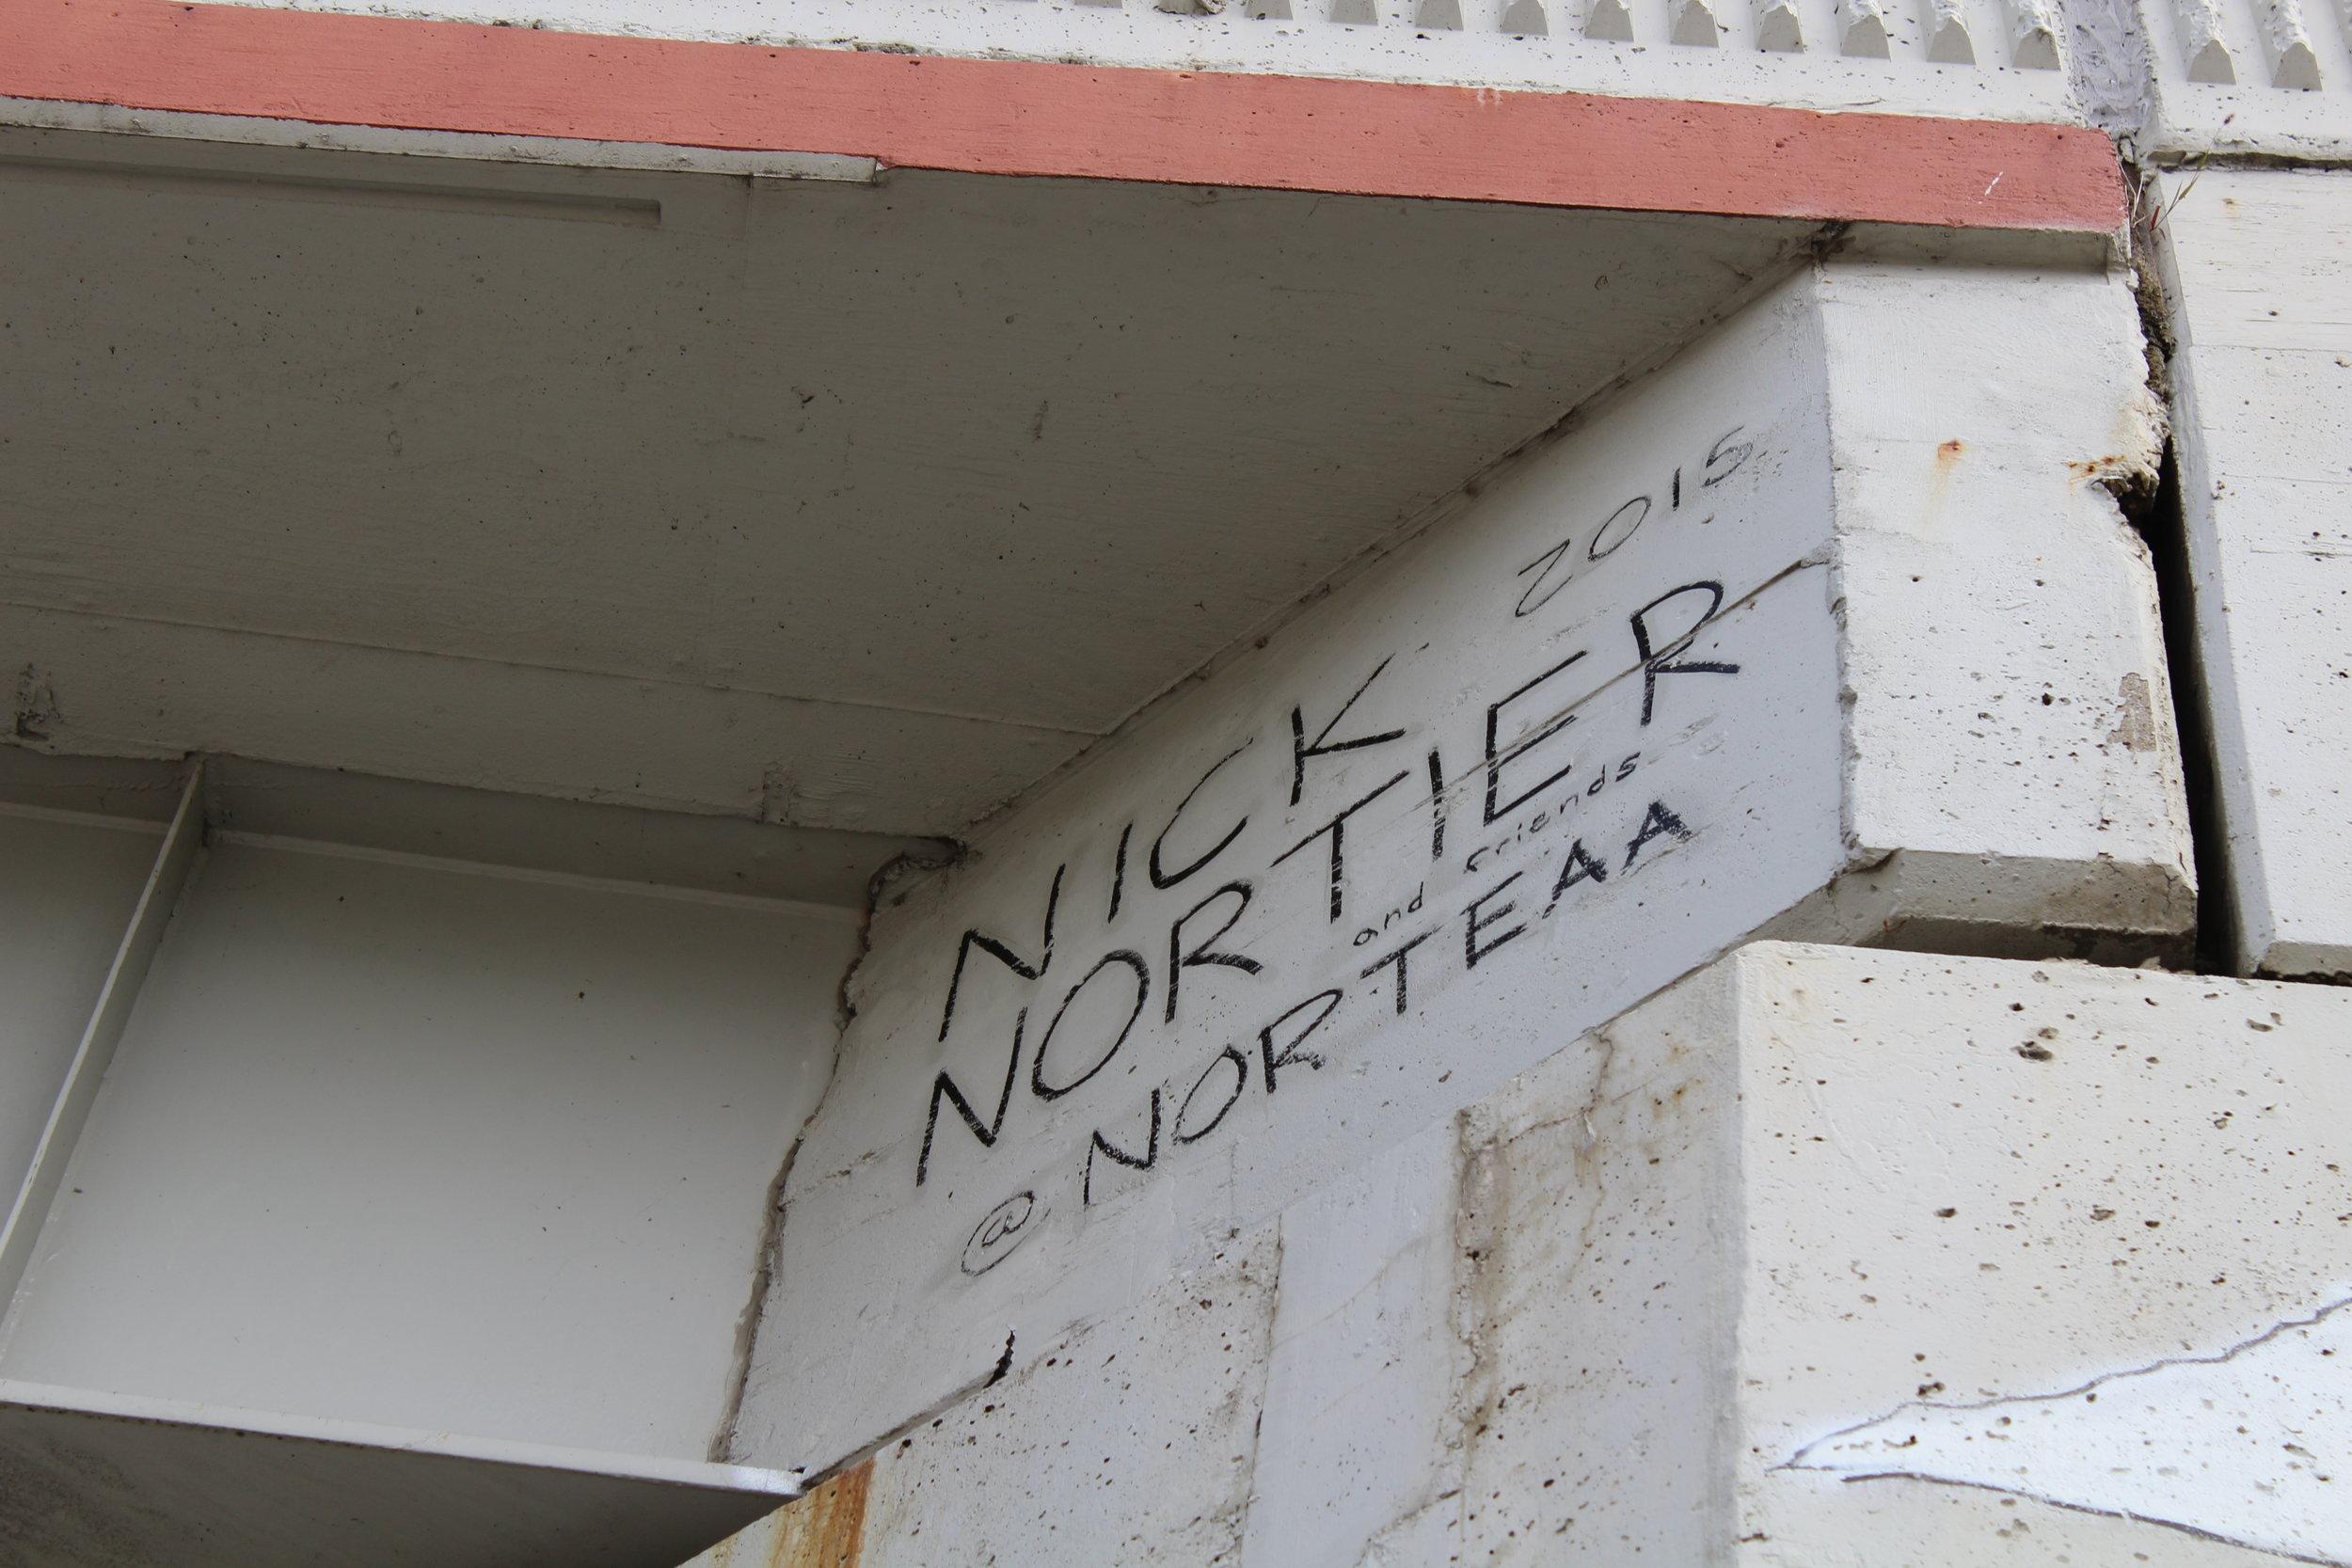 Signature of artist above mural